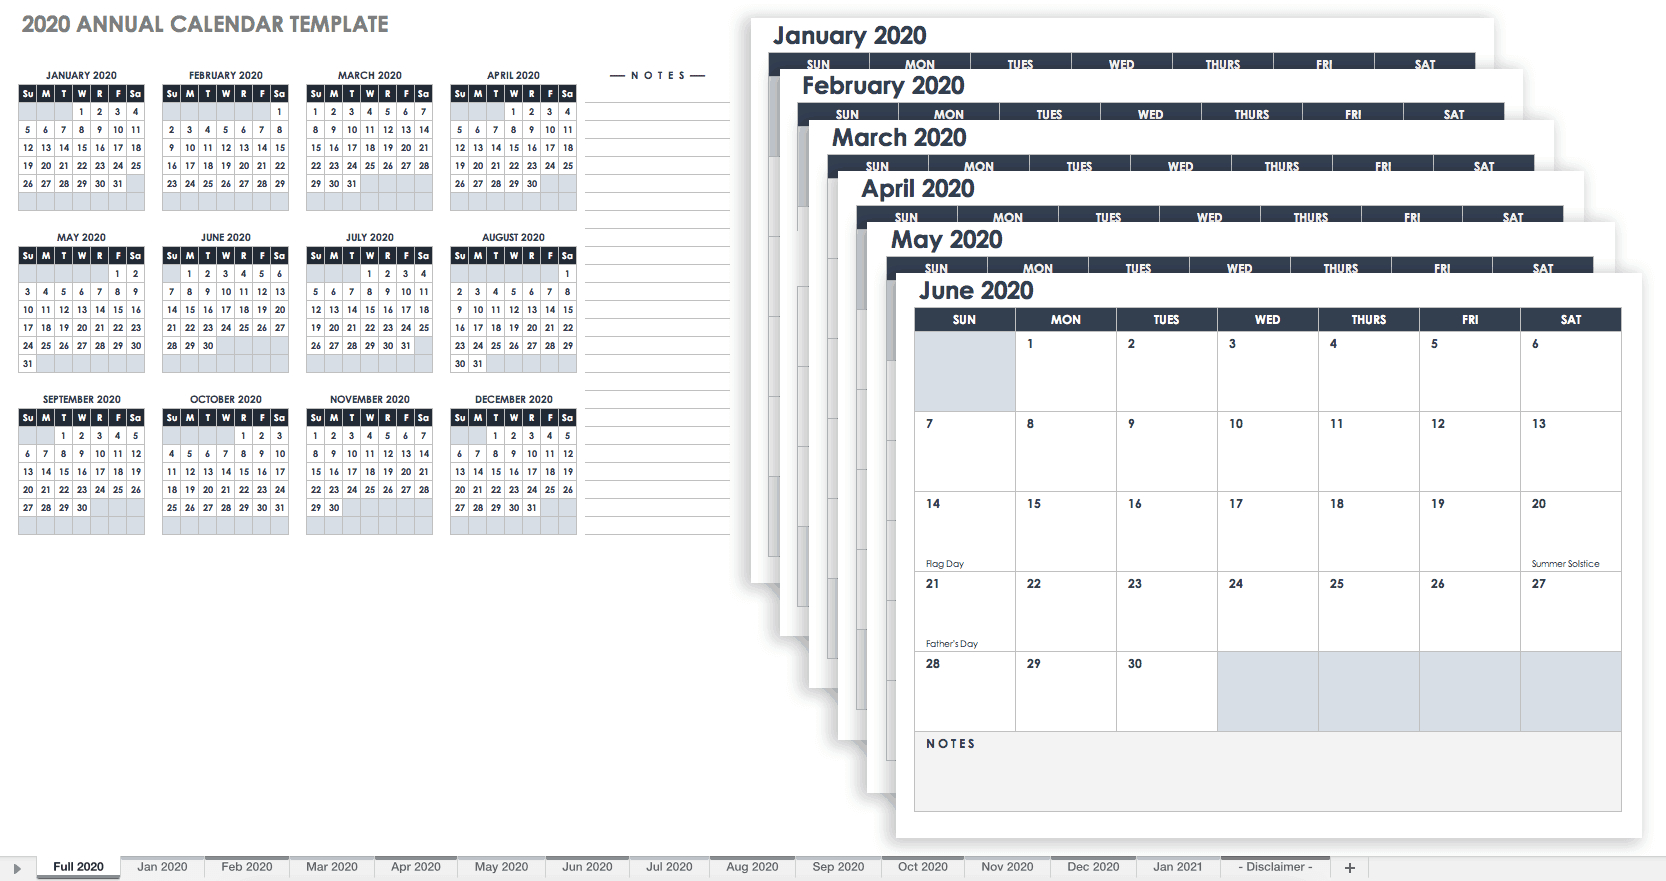 Free Blank Calendar Templates  Smartsheet in Blank Calendar With Lines